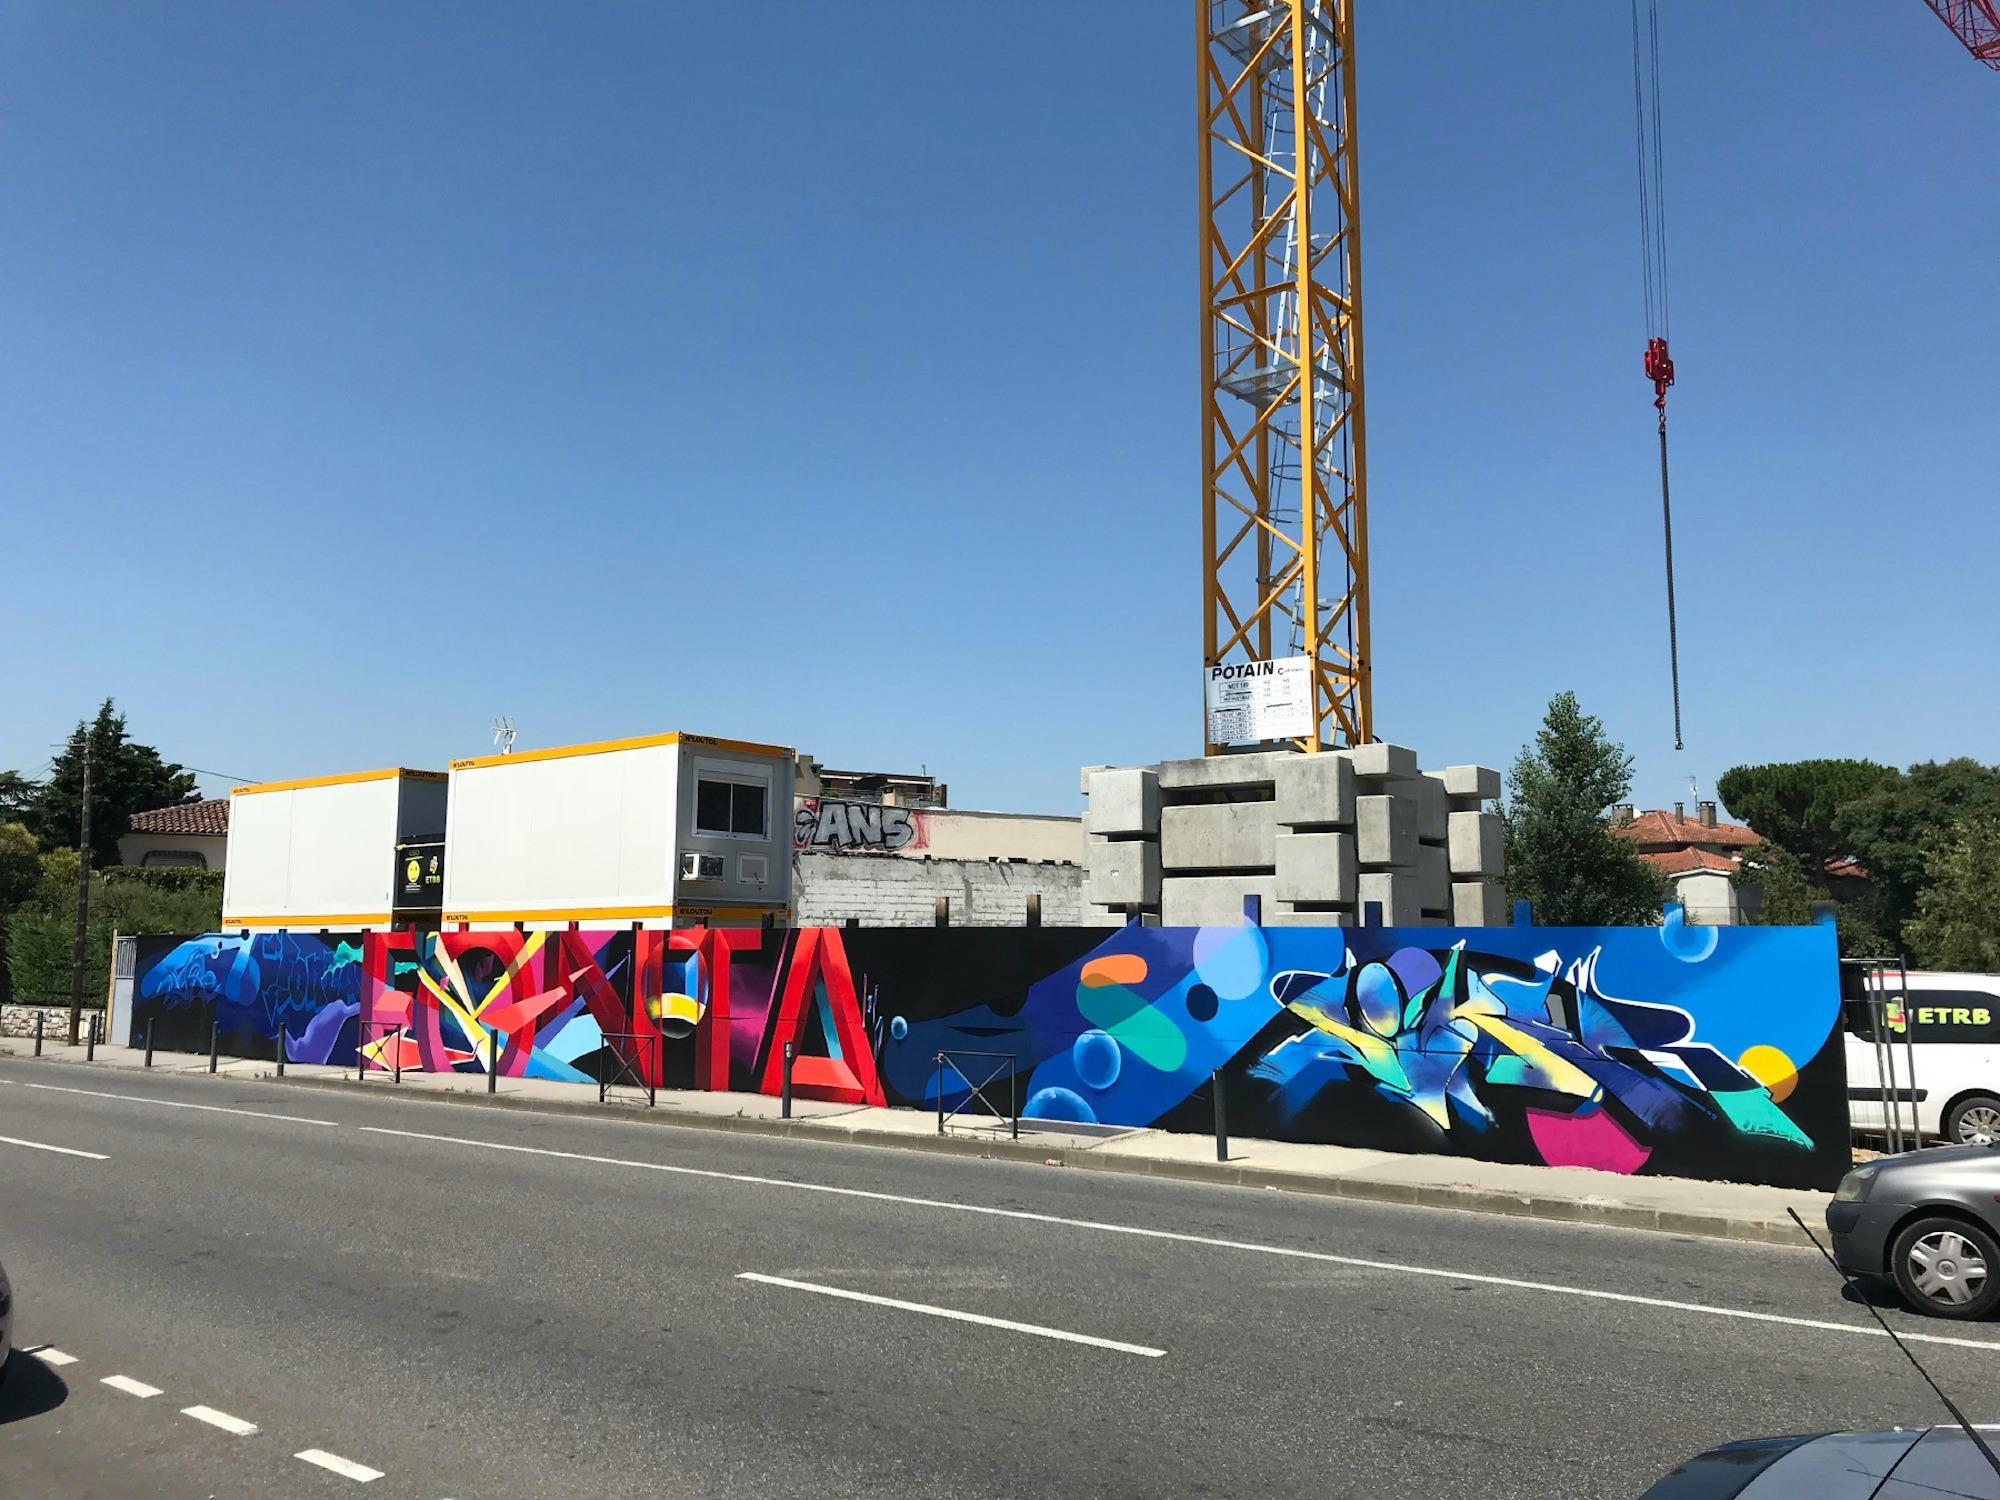 01-Fonta_street_graffiti_toulouse_minimes